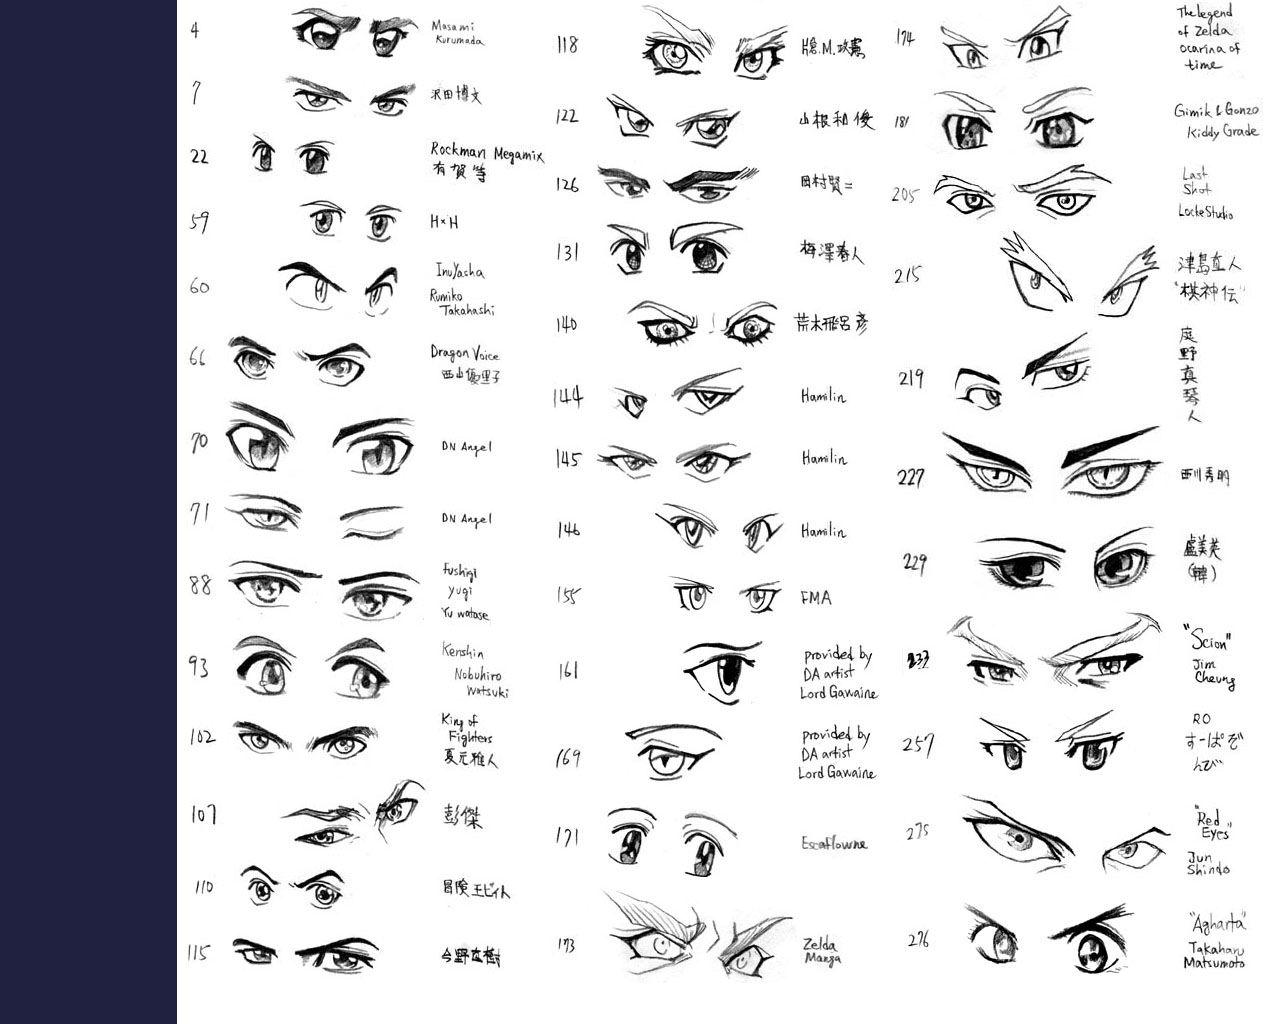 Anime Eyes Anime Eye Drawing How To Draw Anime Hair How To Draw Anime Eyes